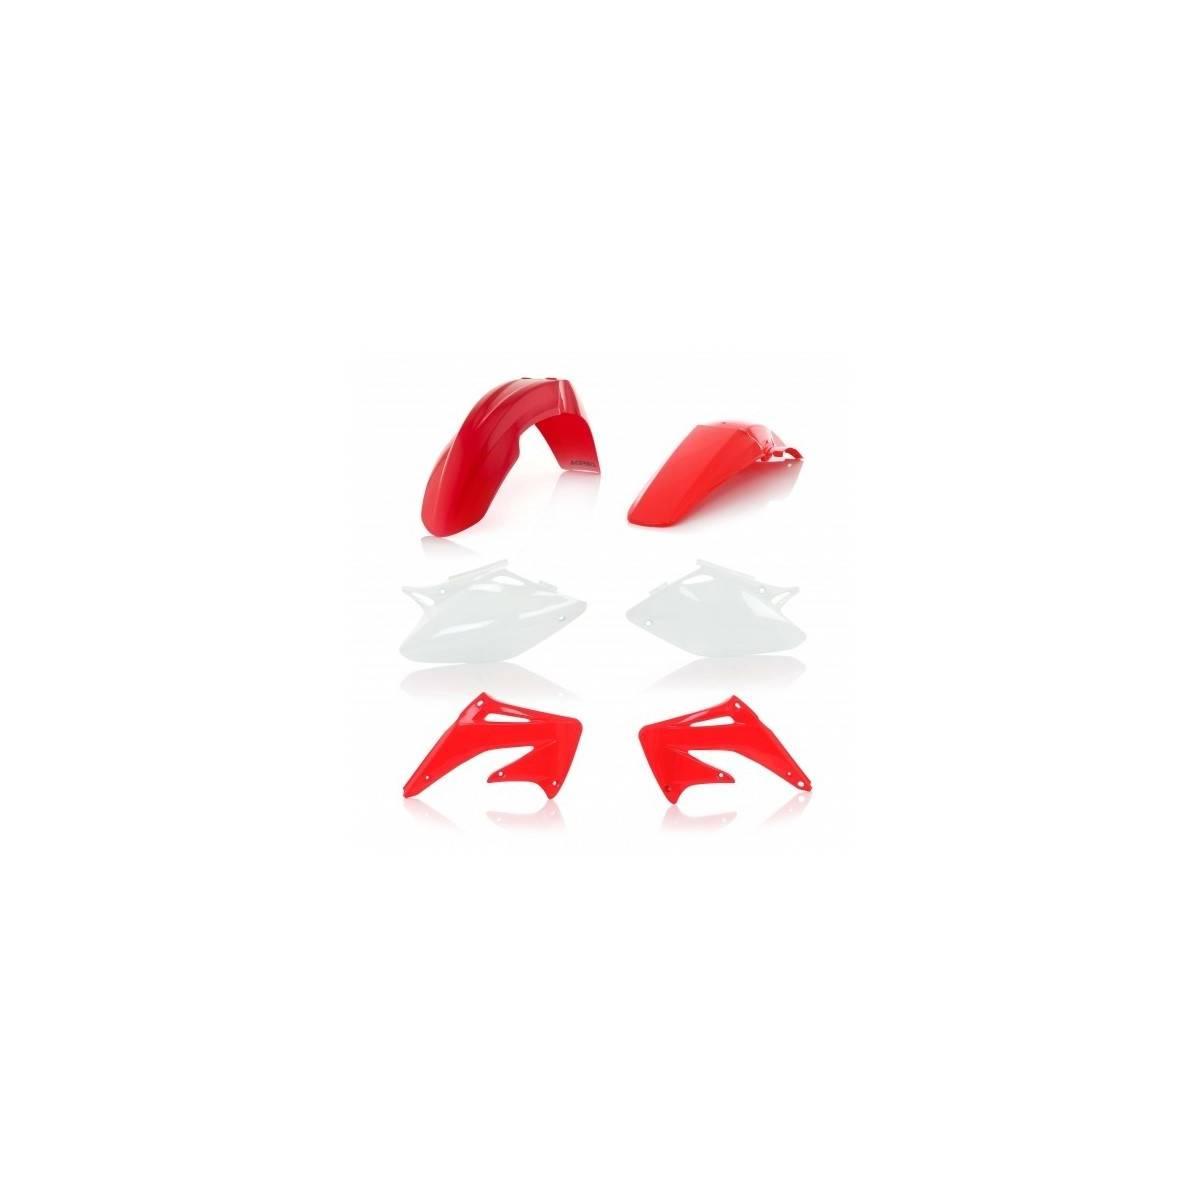 0008098-553 - Kit Plasticos Acerbis Crf250X 04 18 Origen